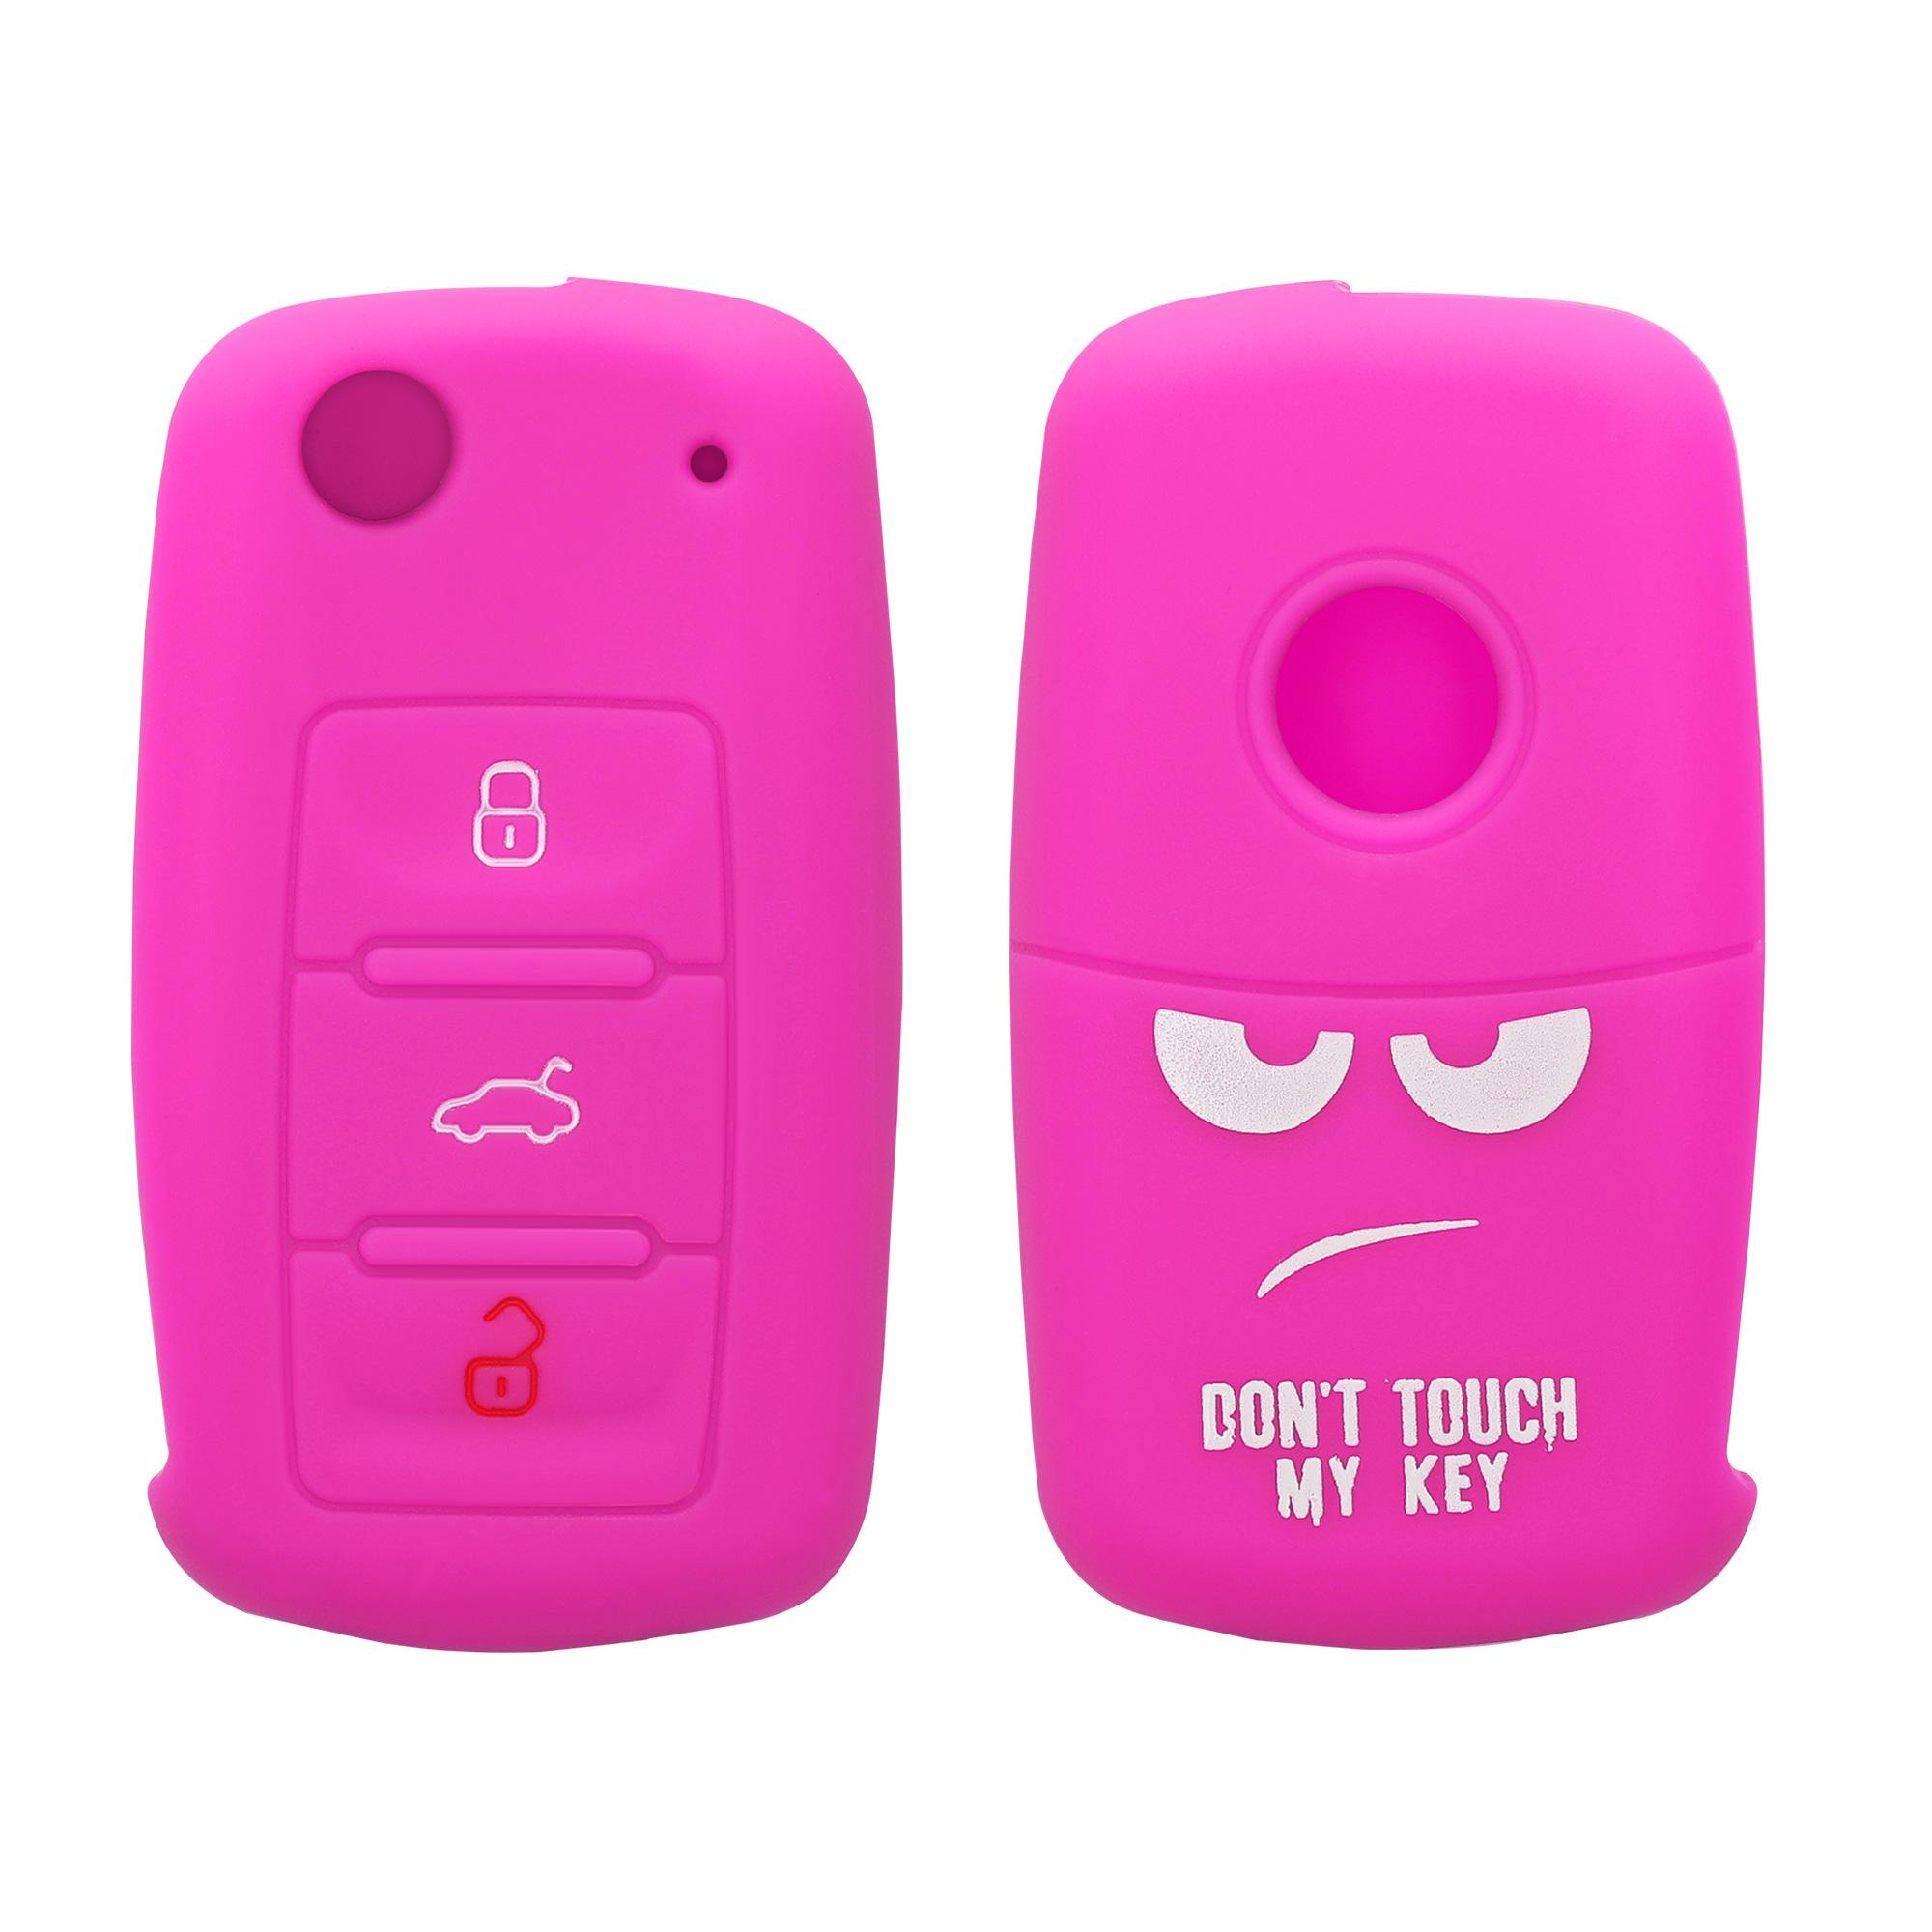 Hülle für VW Skoda Seat Autoschlüssel Silikon Schlüssel Schutzhülle